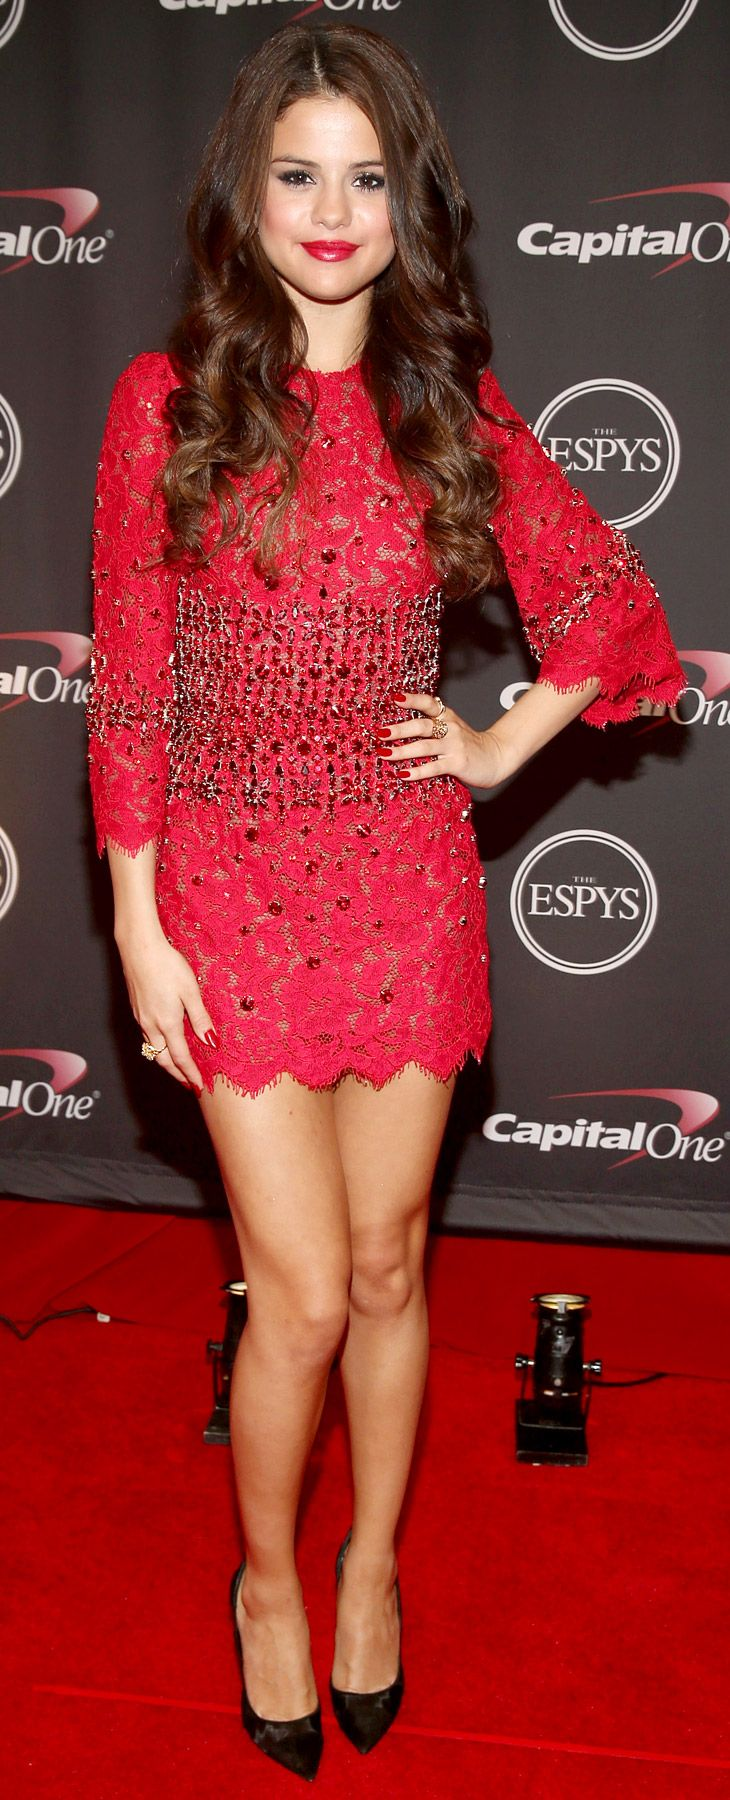 ESPY Awards 2013 Selena Gomez | Selena Gomez - Red Carpet 24/7 - UsMagazine.com